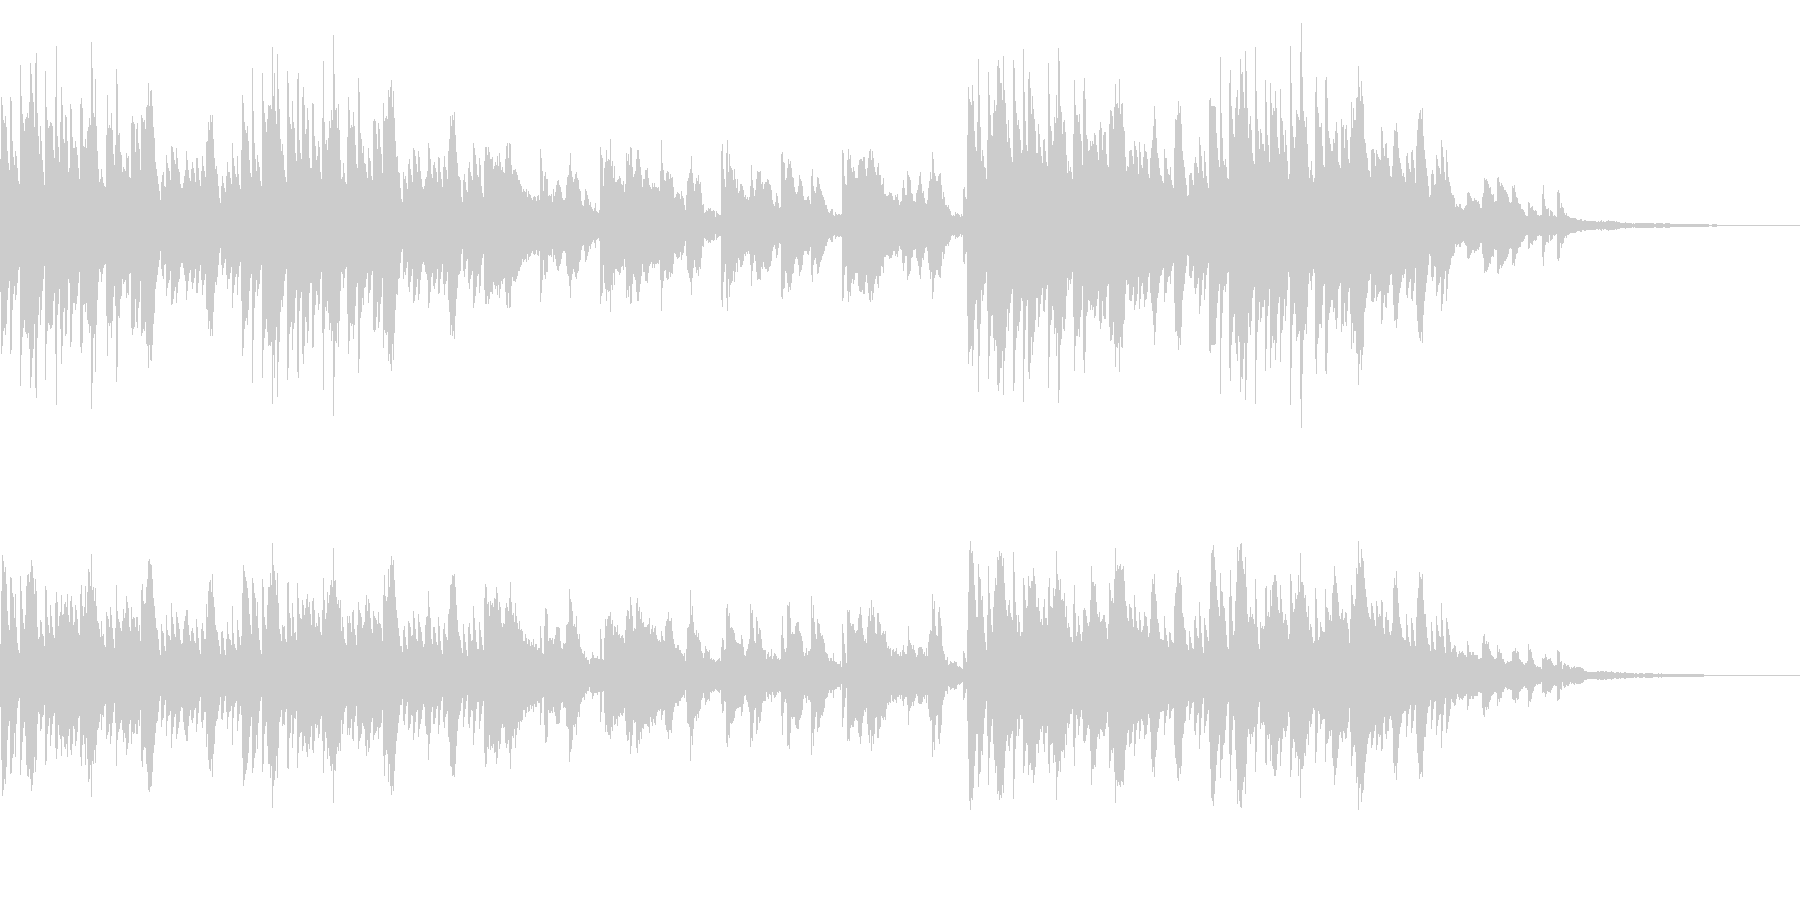 SNS広告 ピアノメイン スタイリッシュの未再生の波形